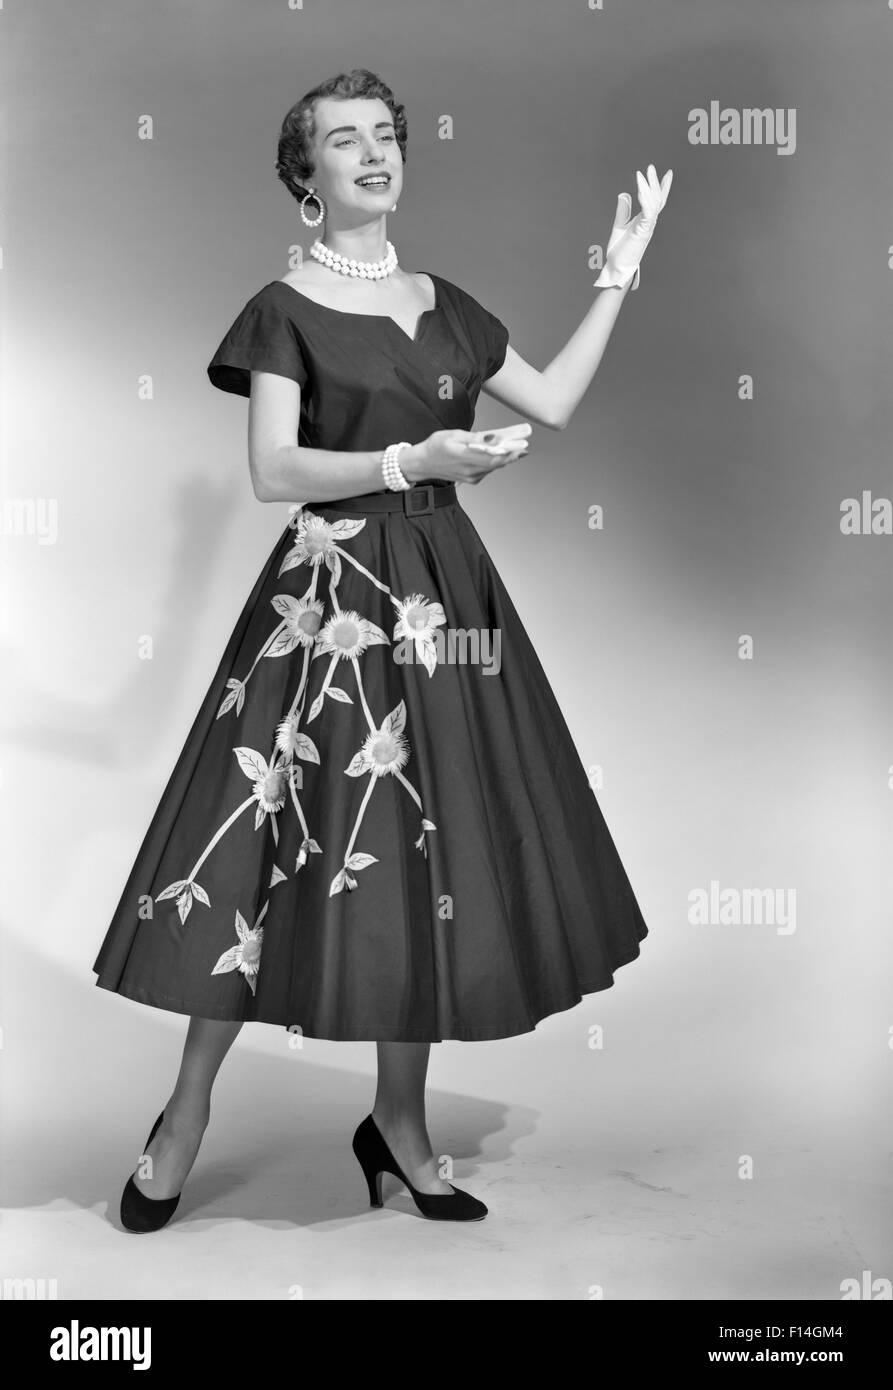 Black dress gloves - 1950s Brunette Woman Wearing Black Dress With Flowers Gloves Pearl Choker